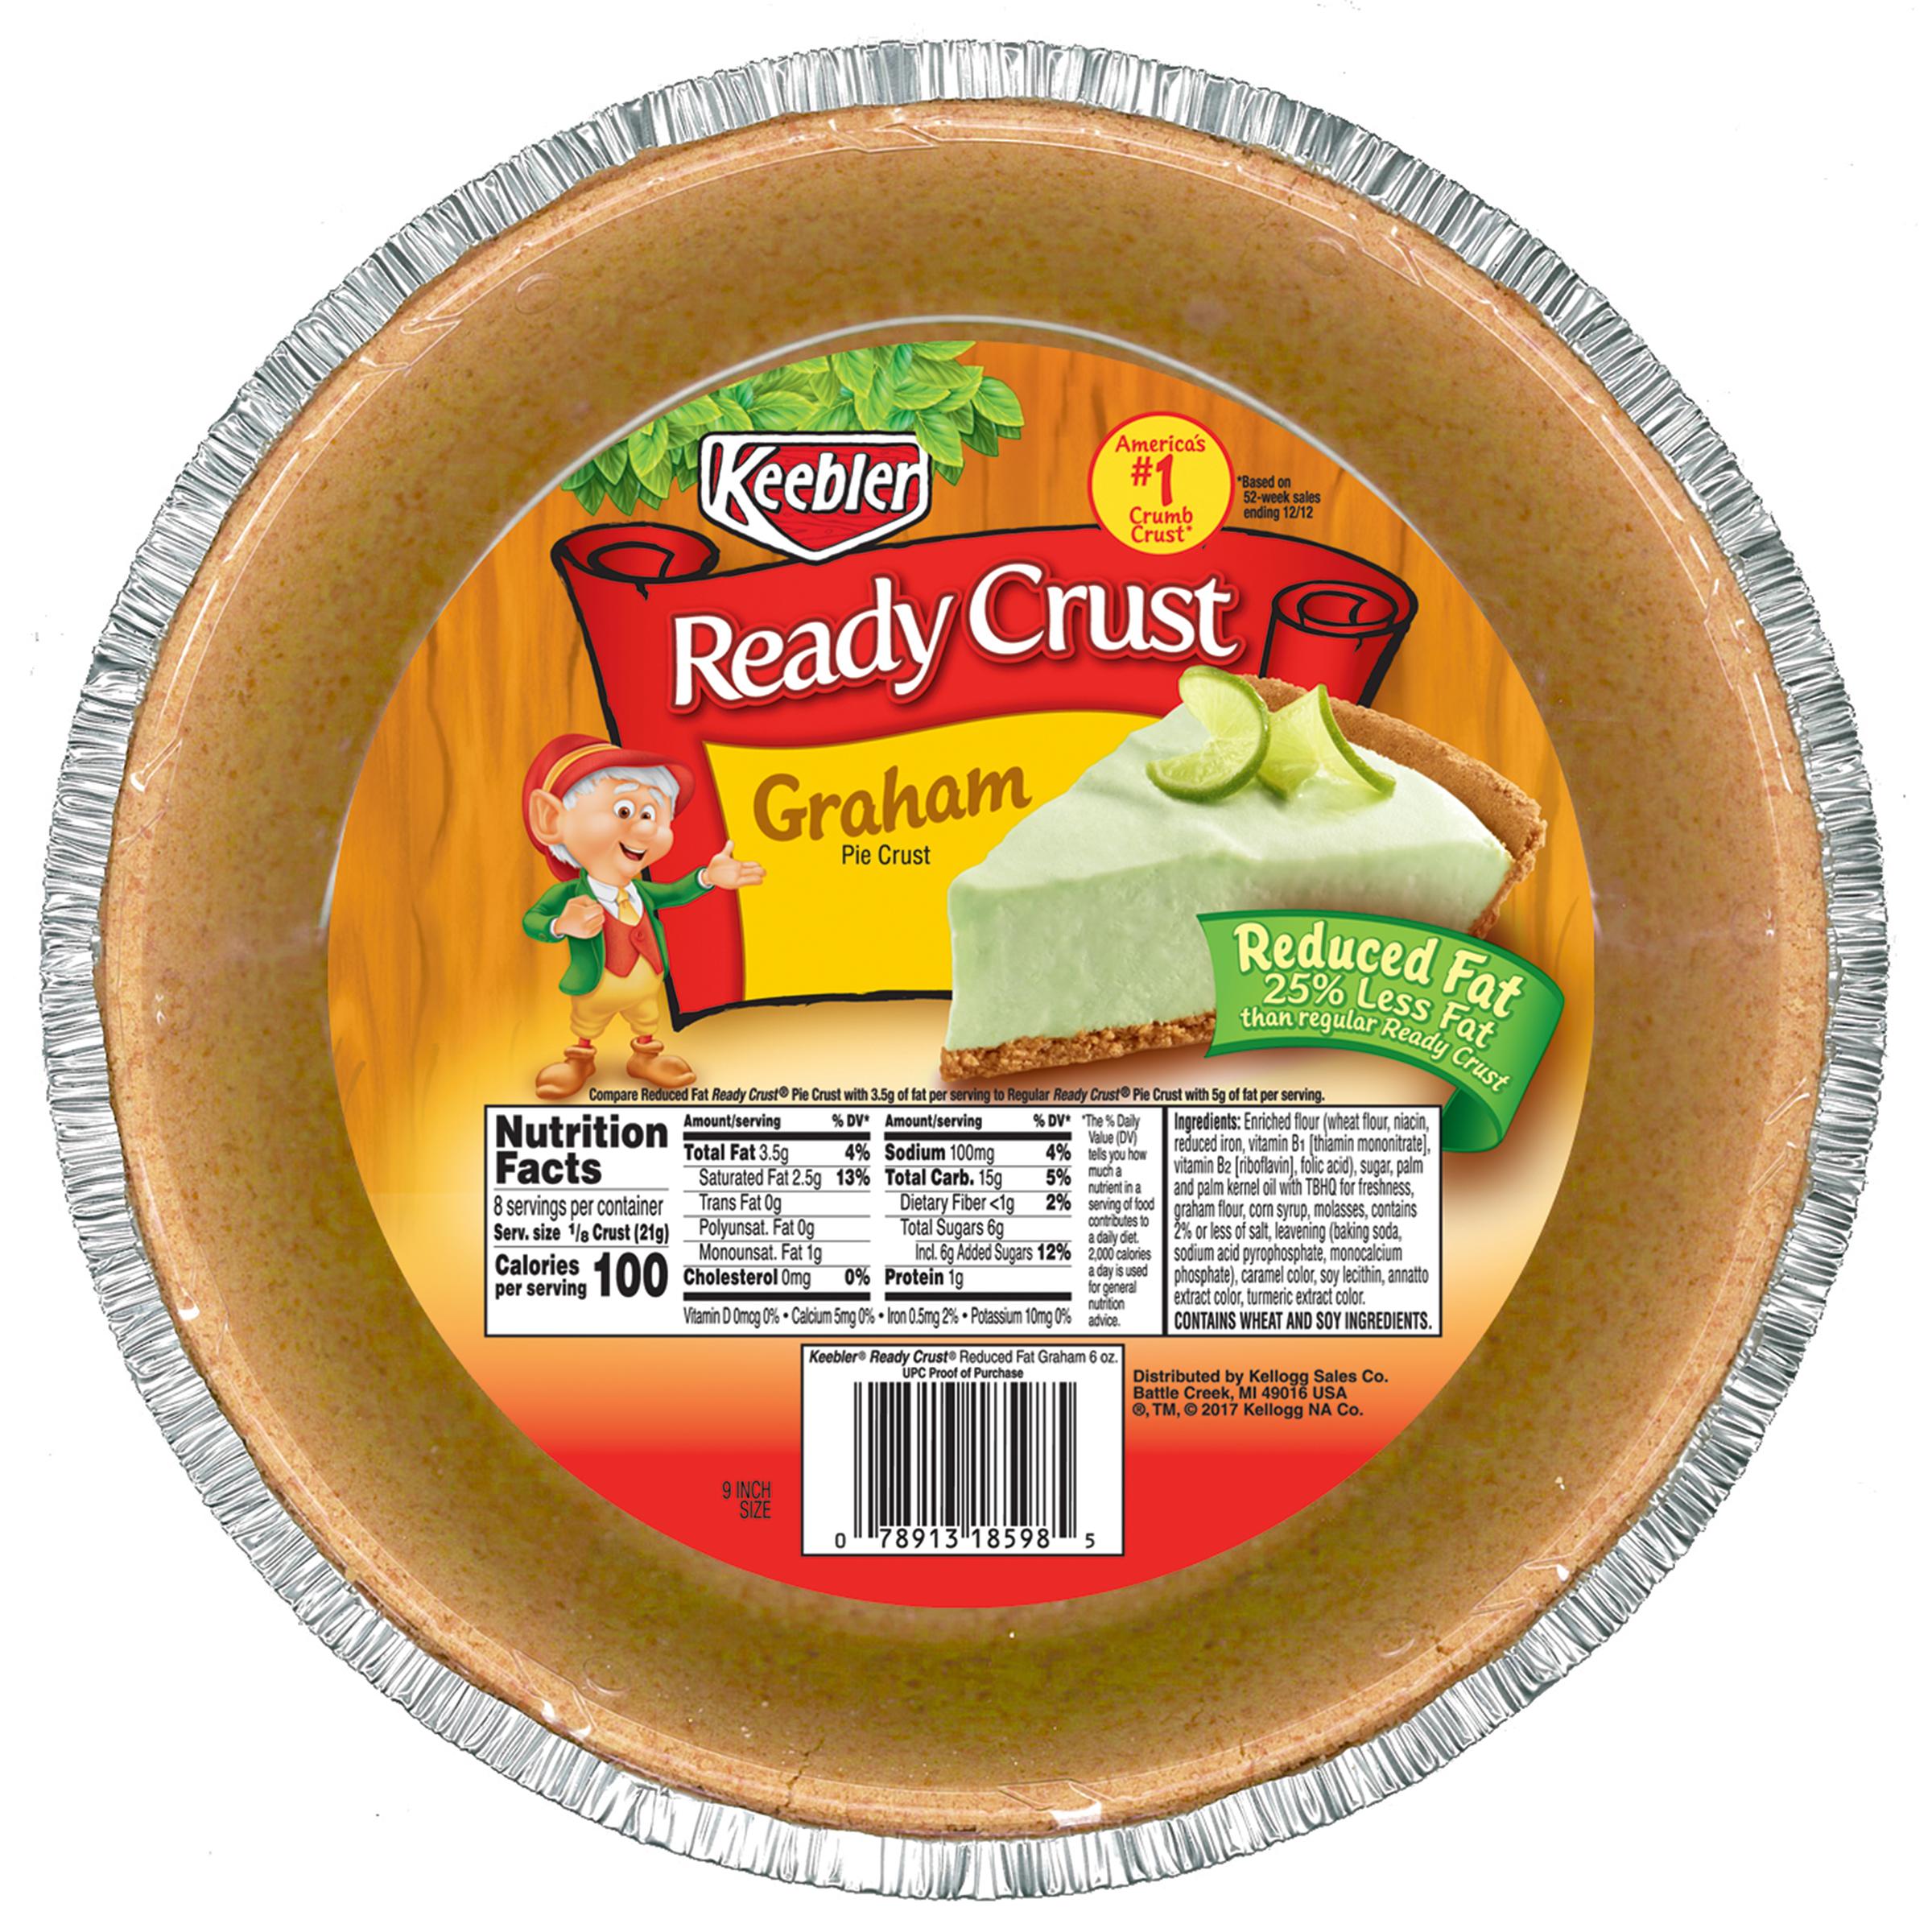 Keebler Ready Crust Reduced Fat Graham Pie Crust